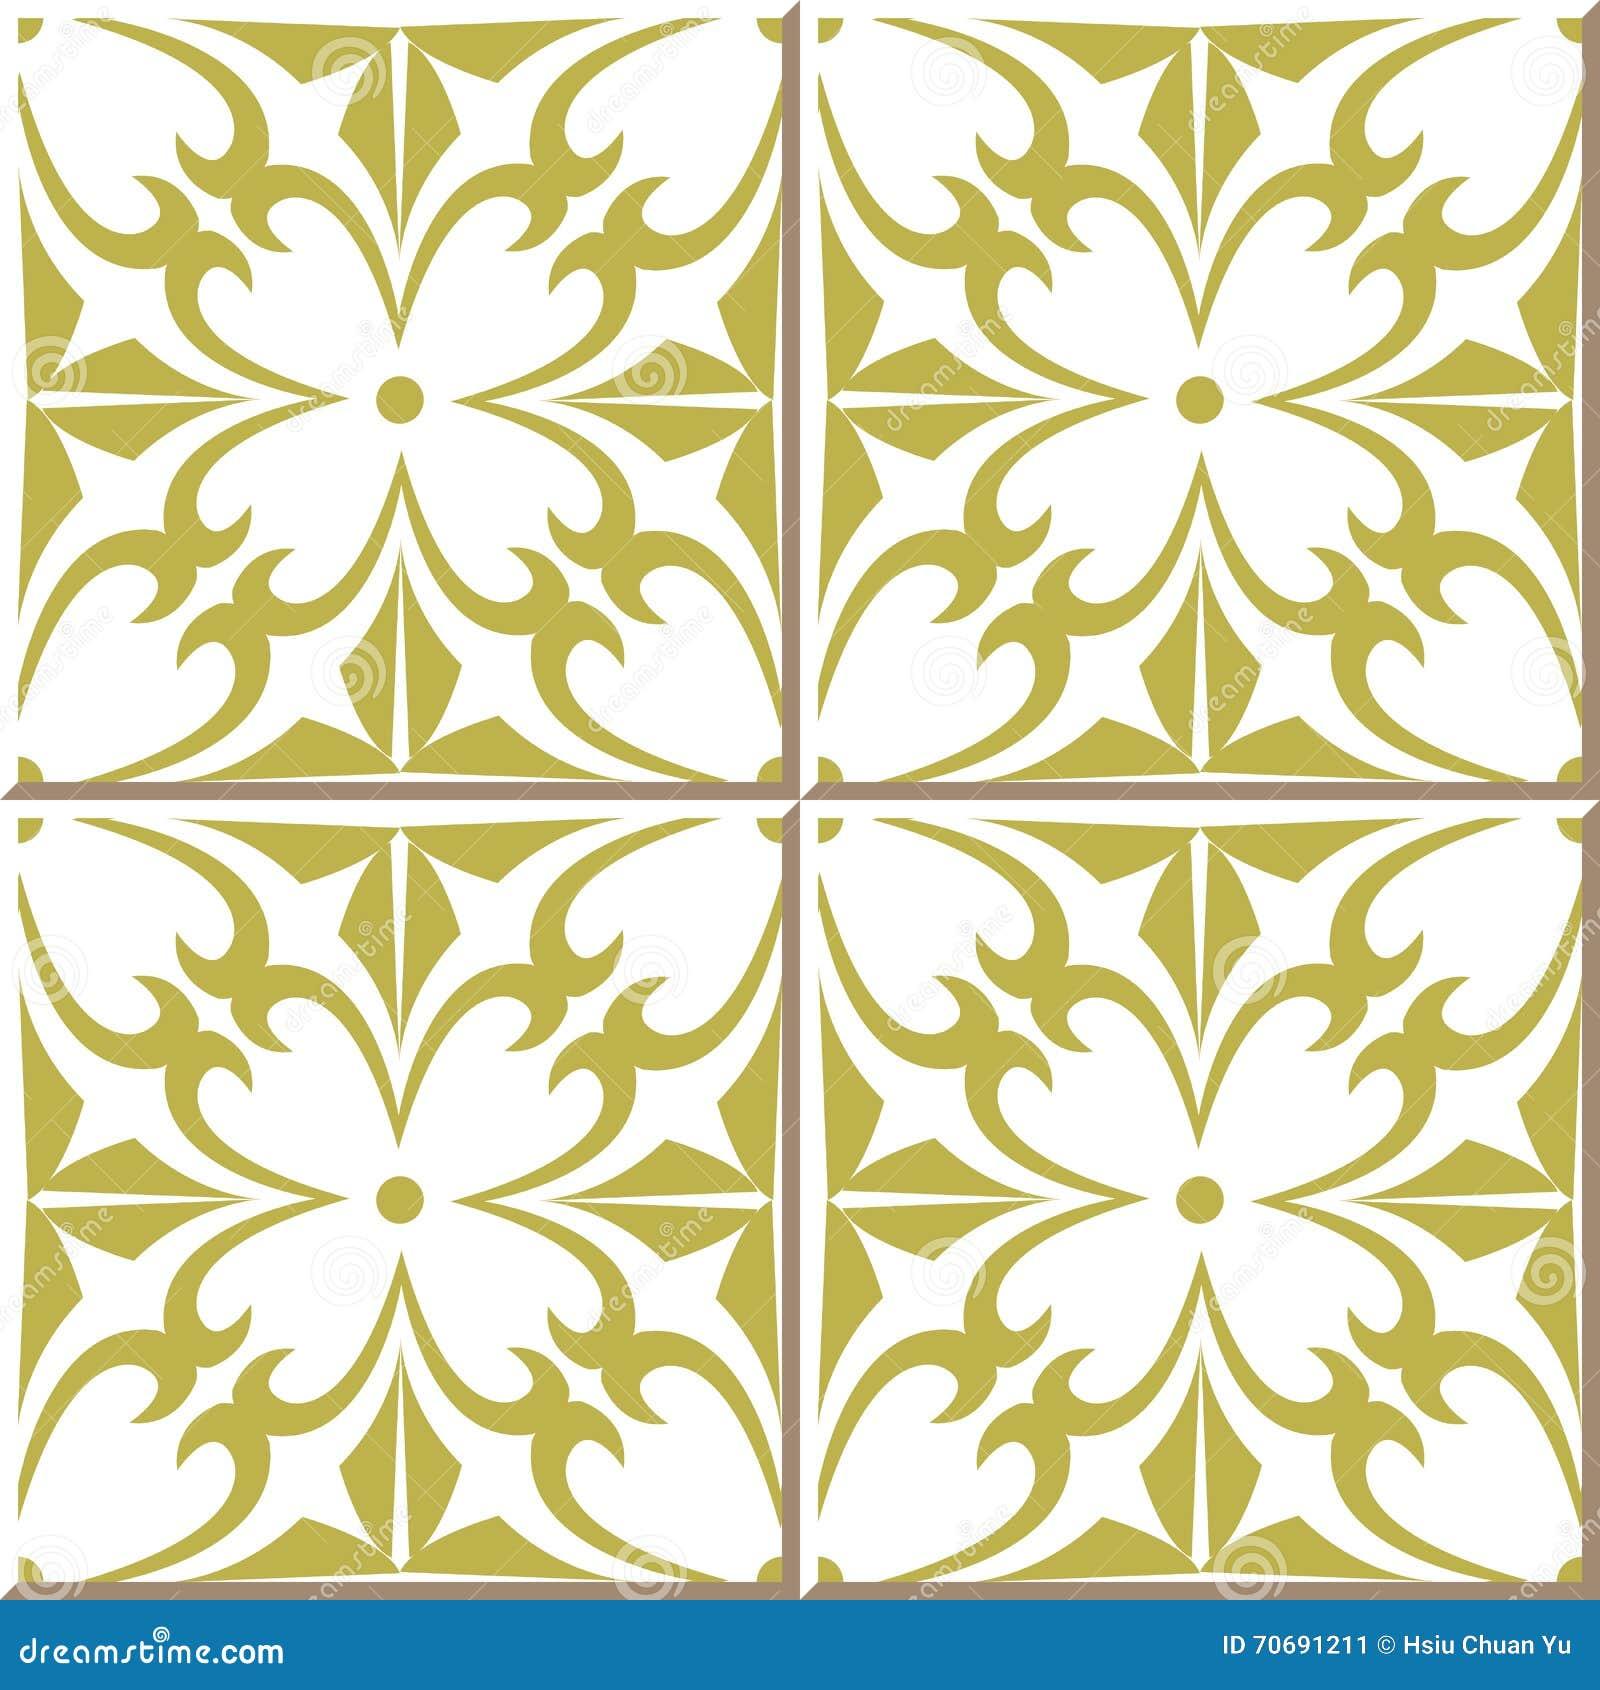 Vintage Seamless Wall Tiles Of Vintage Golden Spiral Cross Flower ...